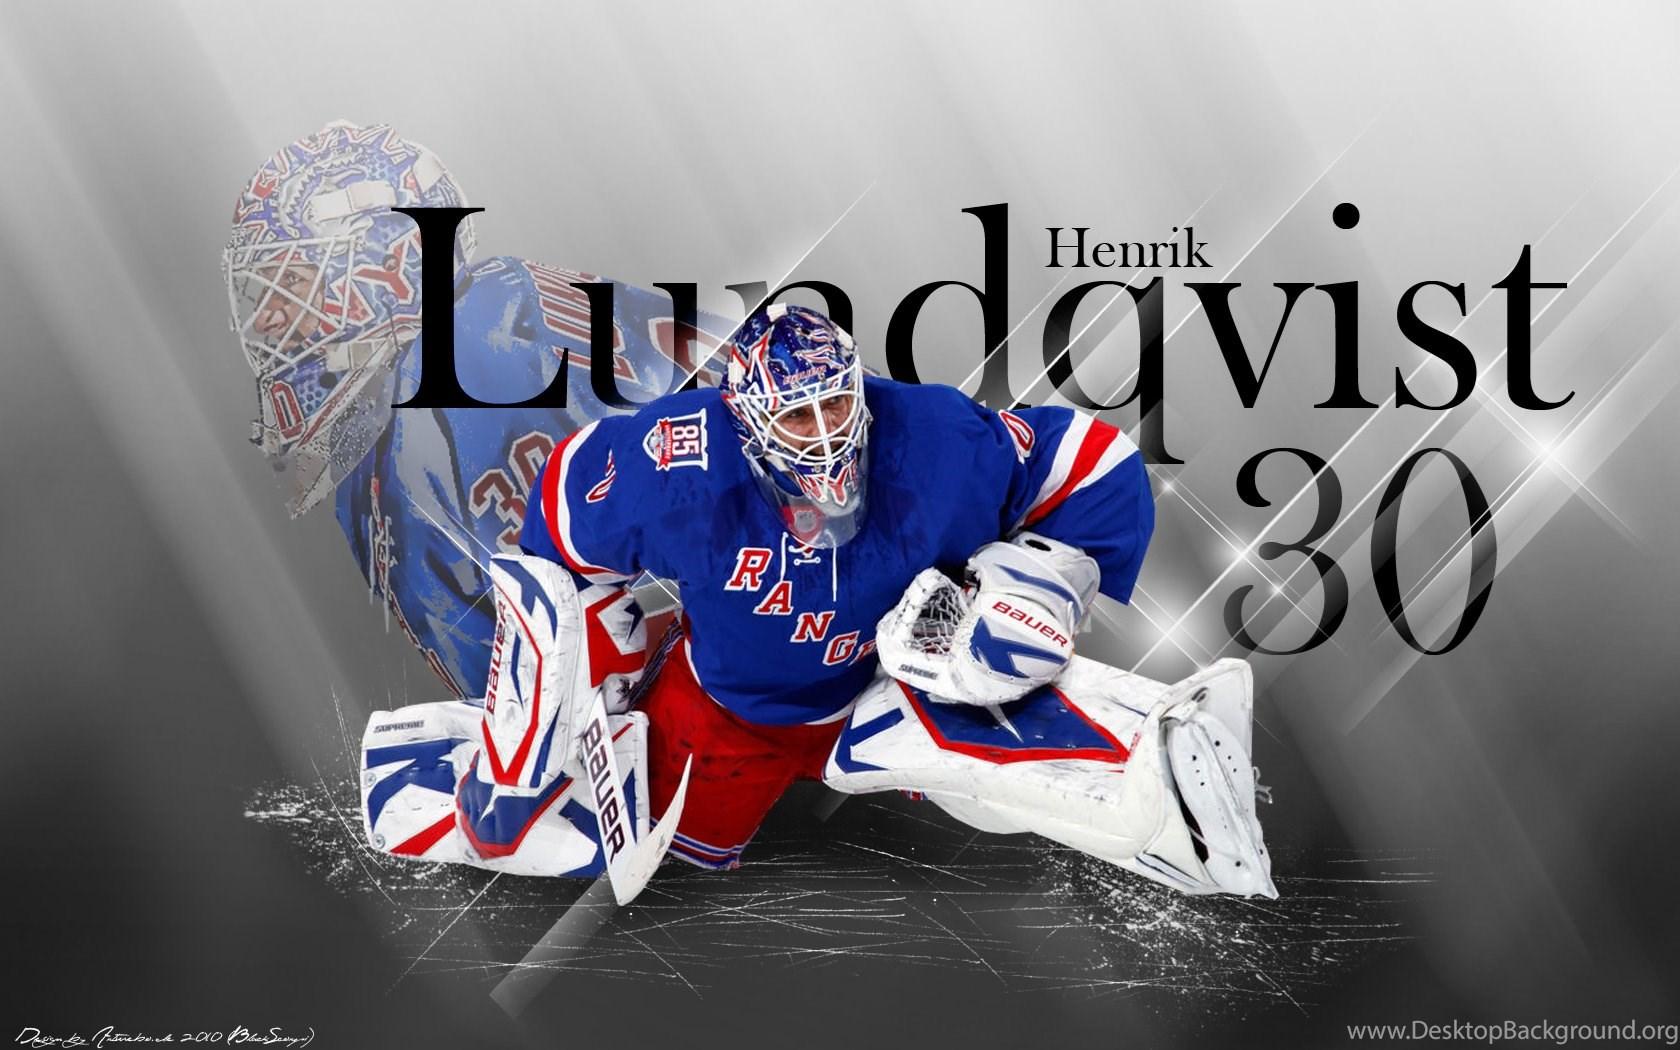 Nhl New York Rangers Hockey Player Henrik Ludqvist Wallpapers Hd Desktop Background